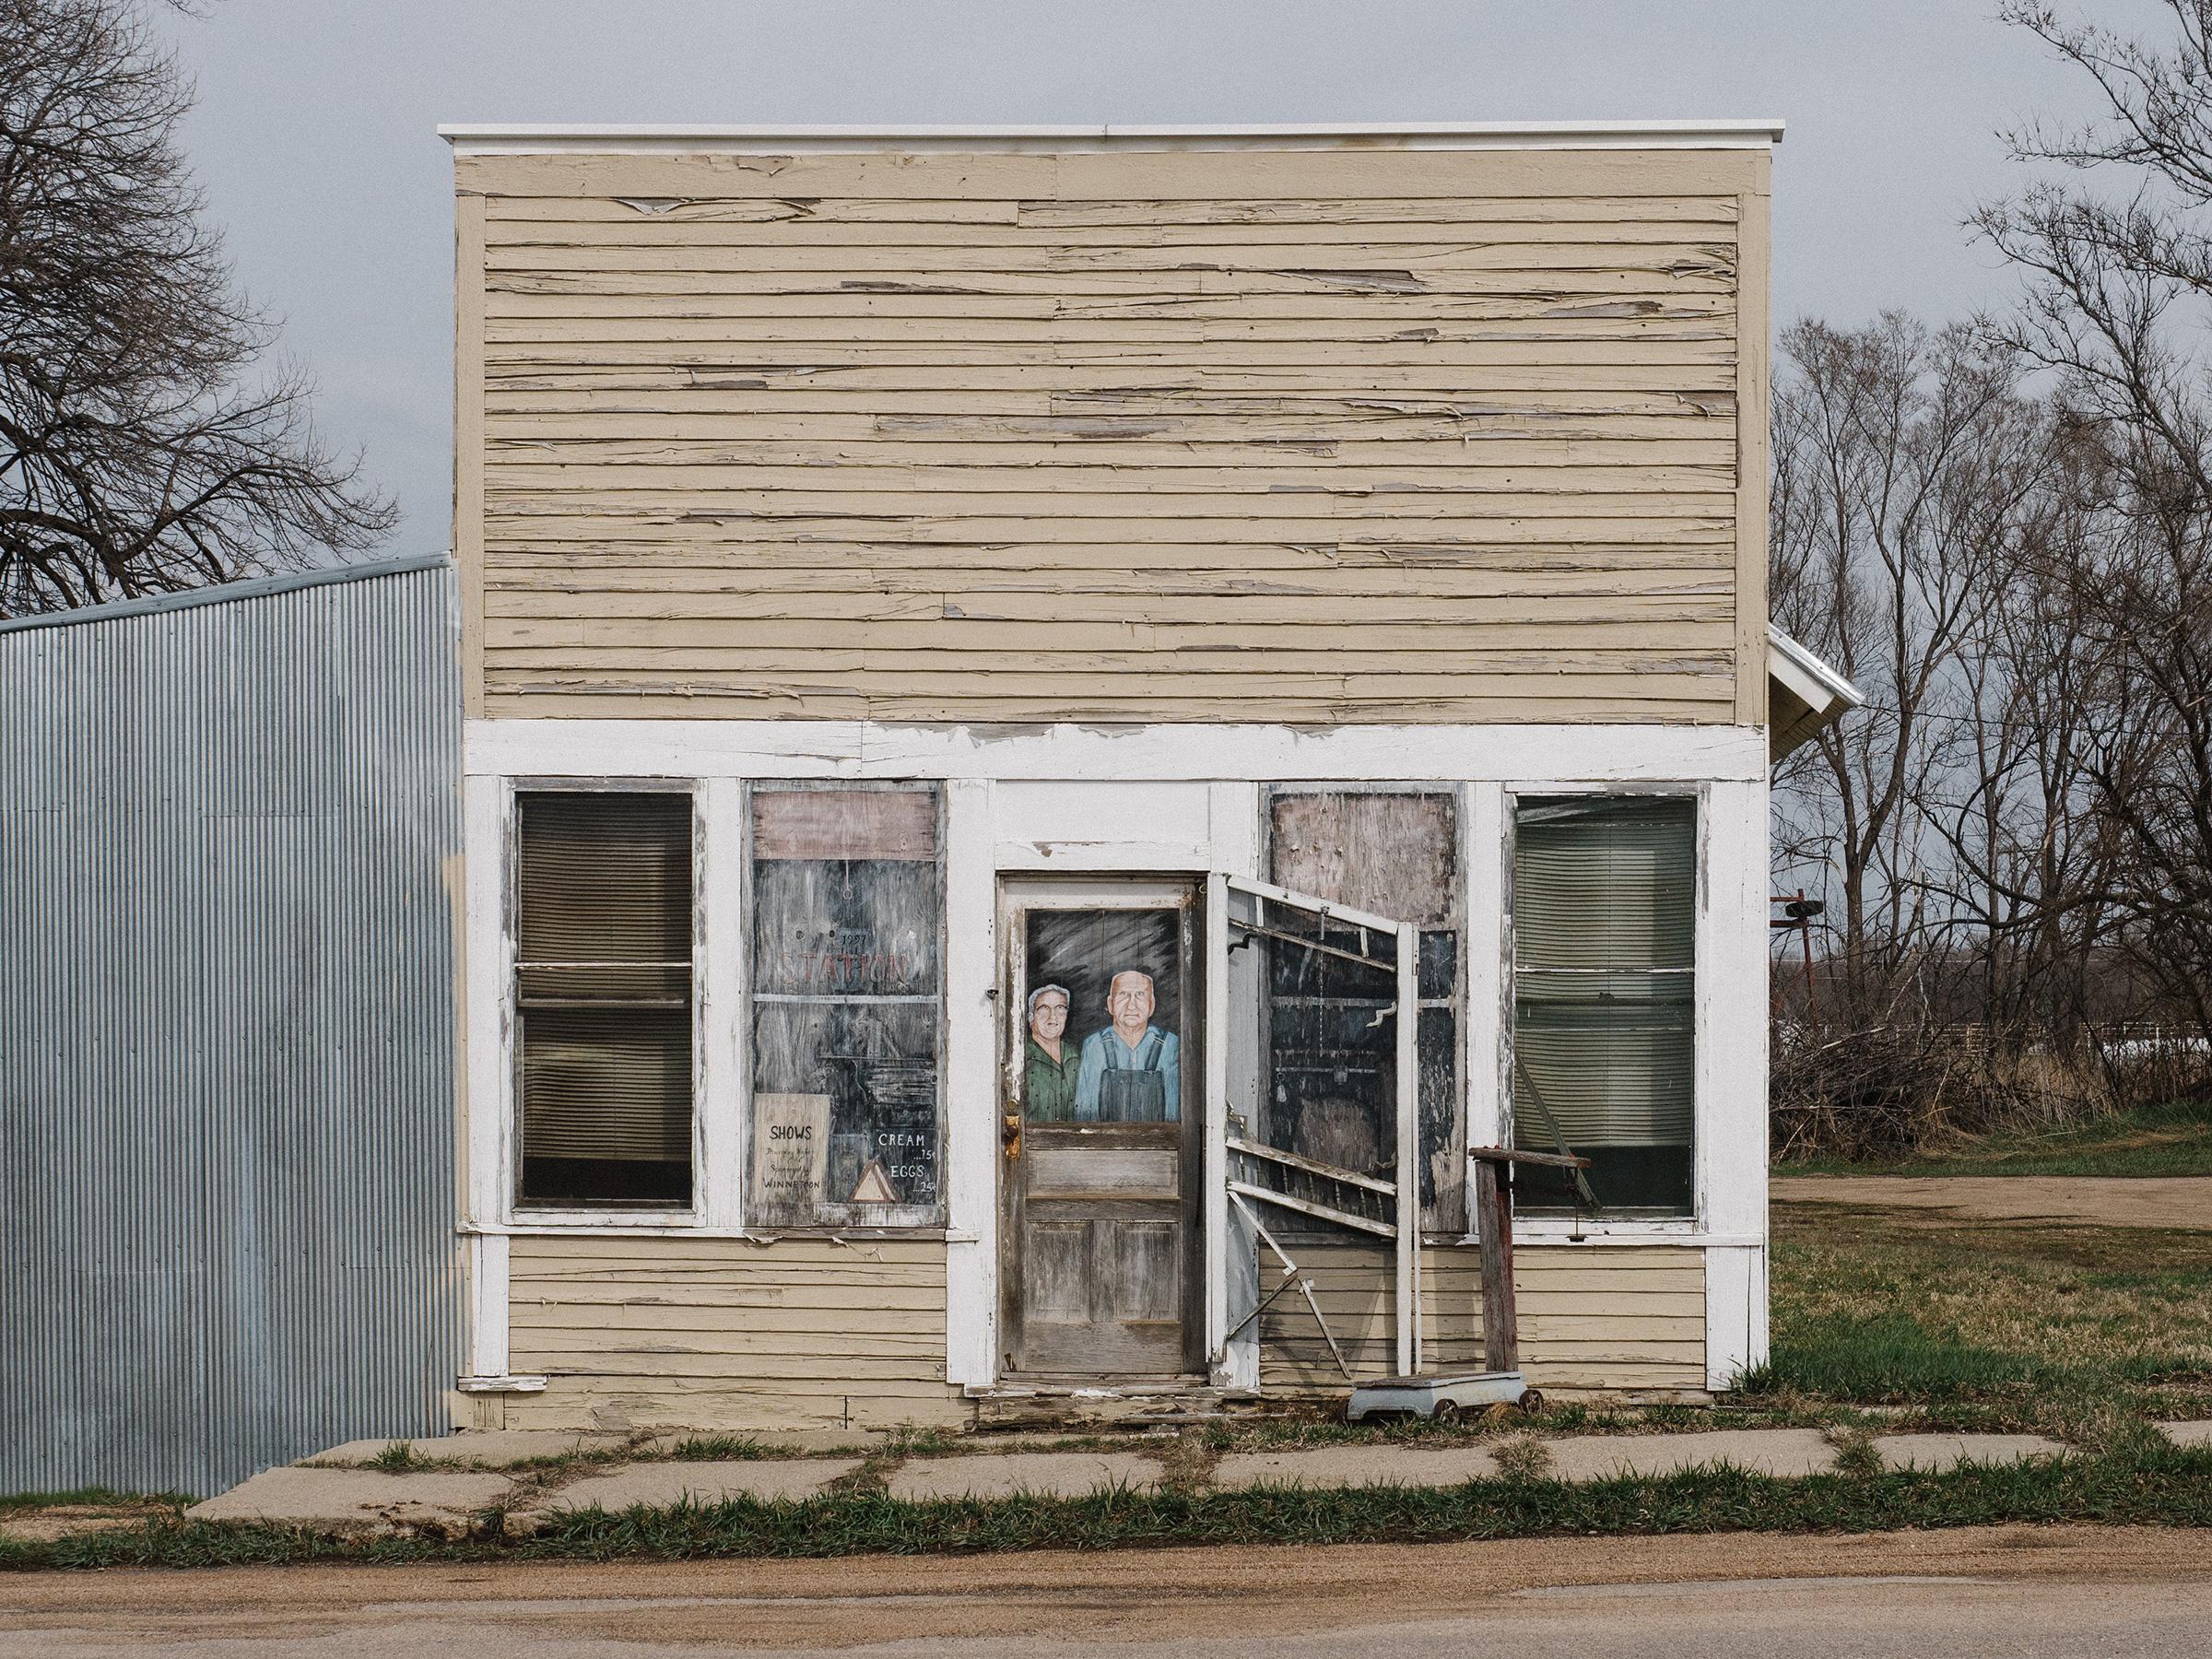 Winnetoon, Nebraska